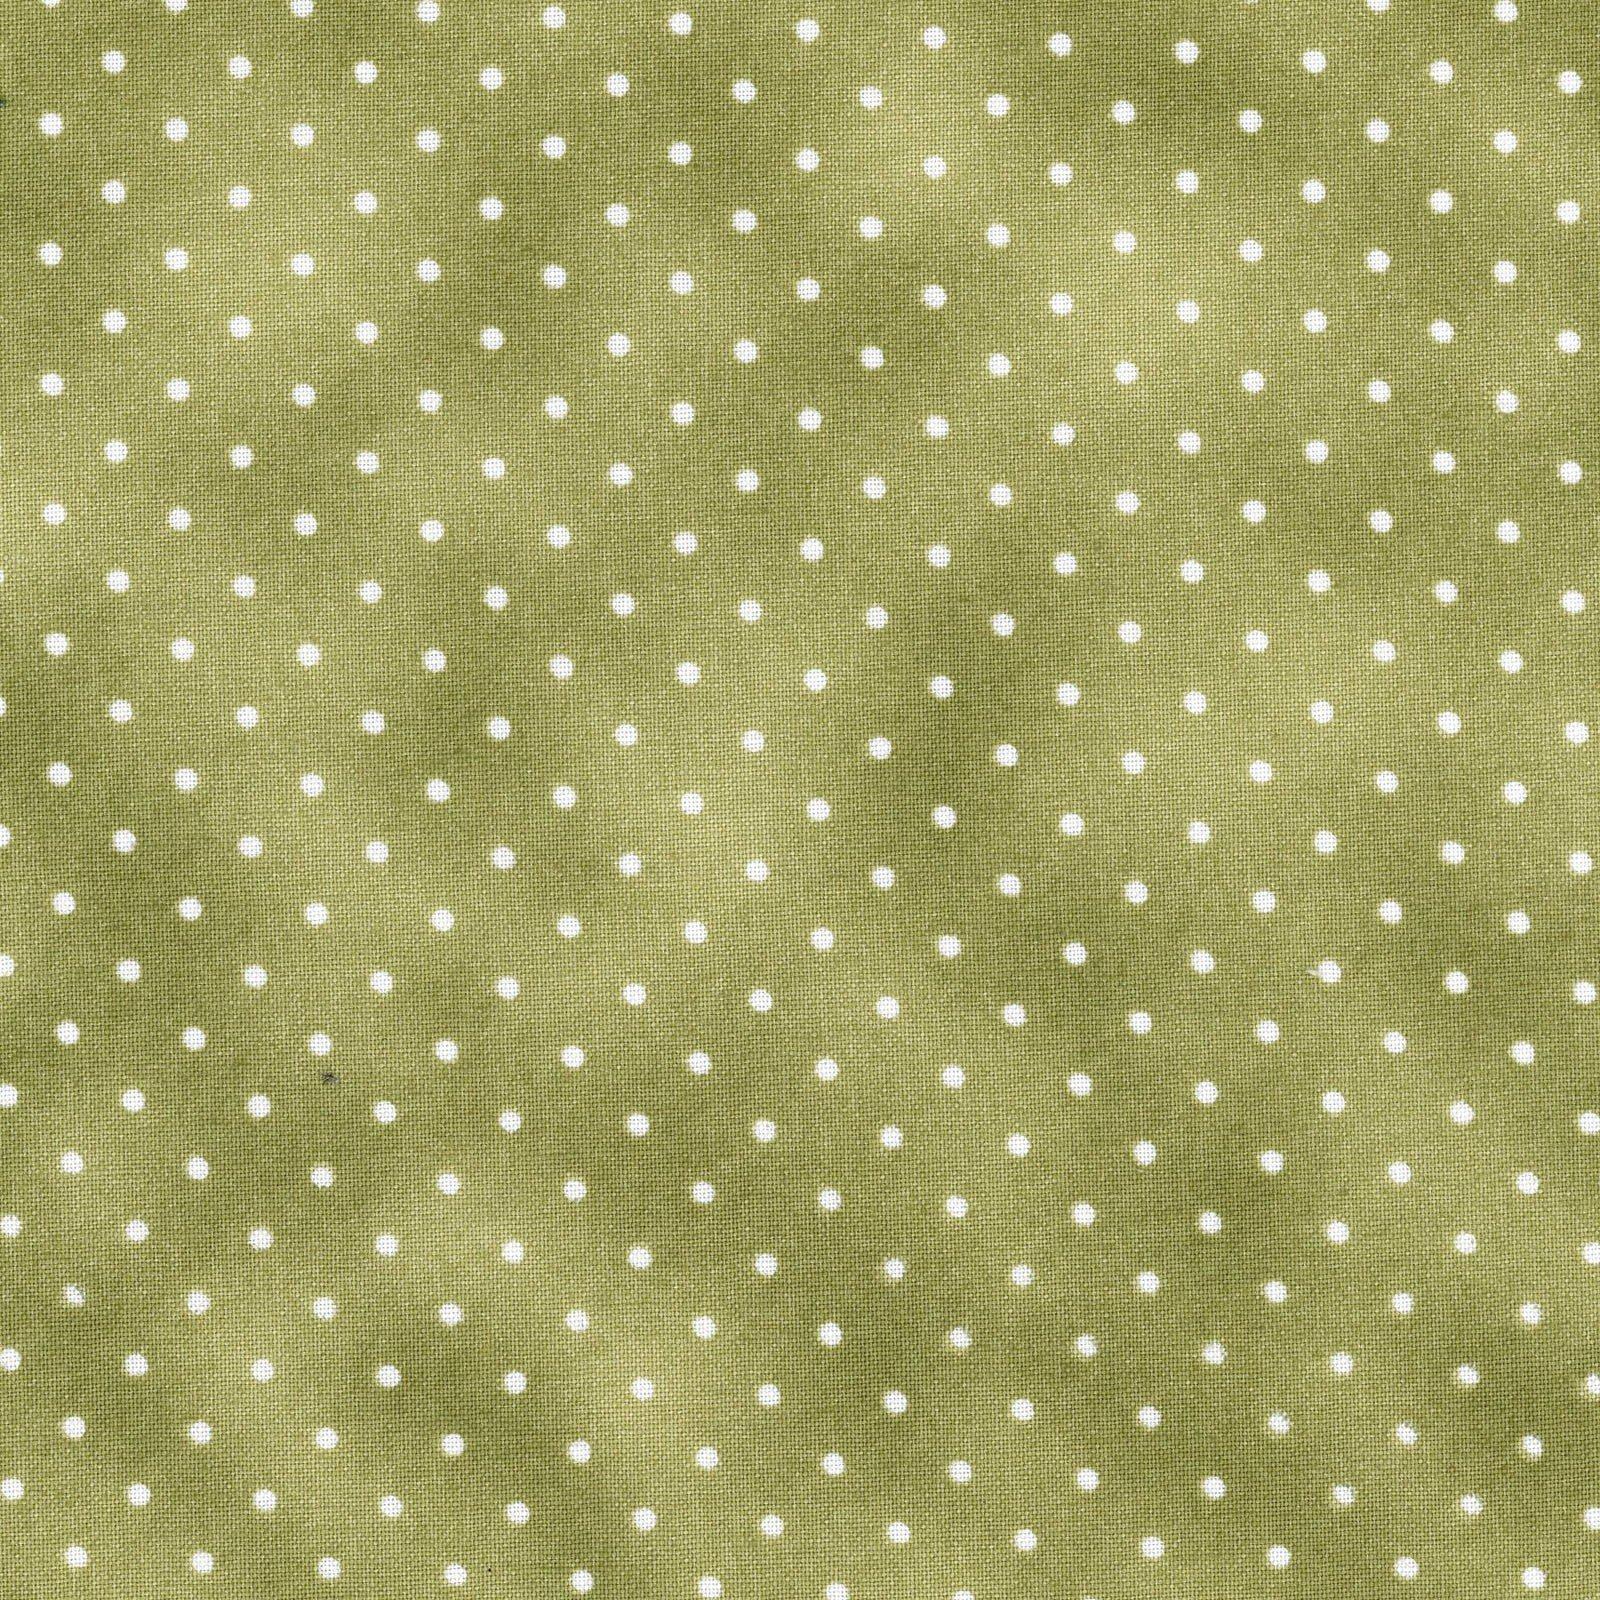 Pin Dots - Lt Olive FQ<br/>Maywood Studio 609-G3